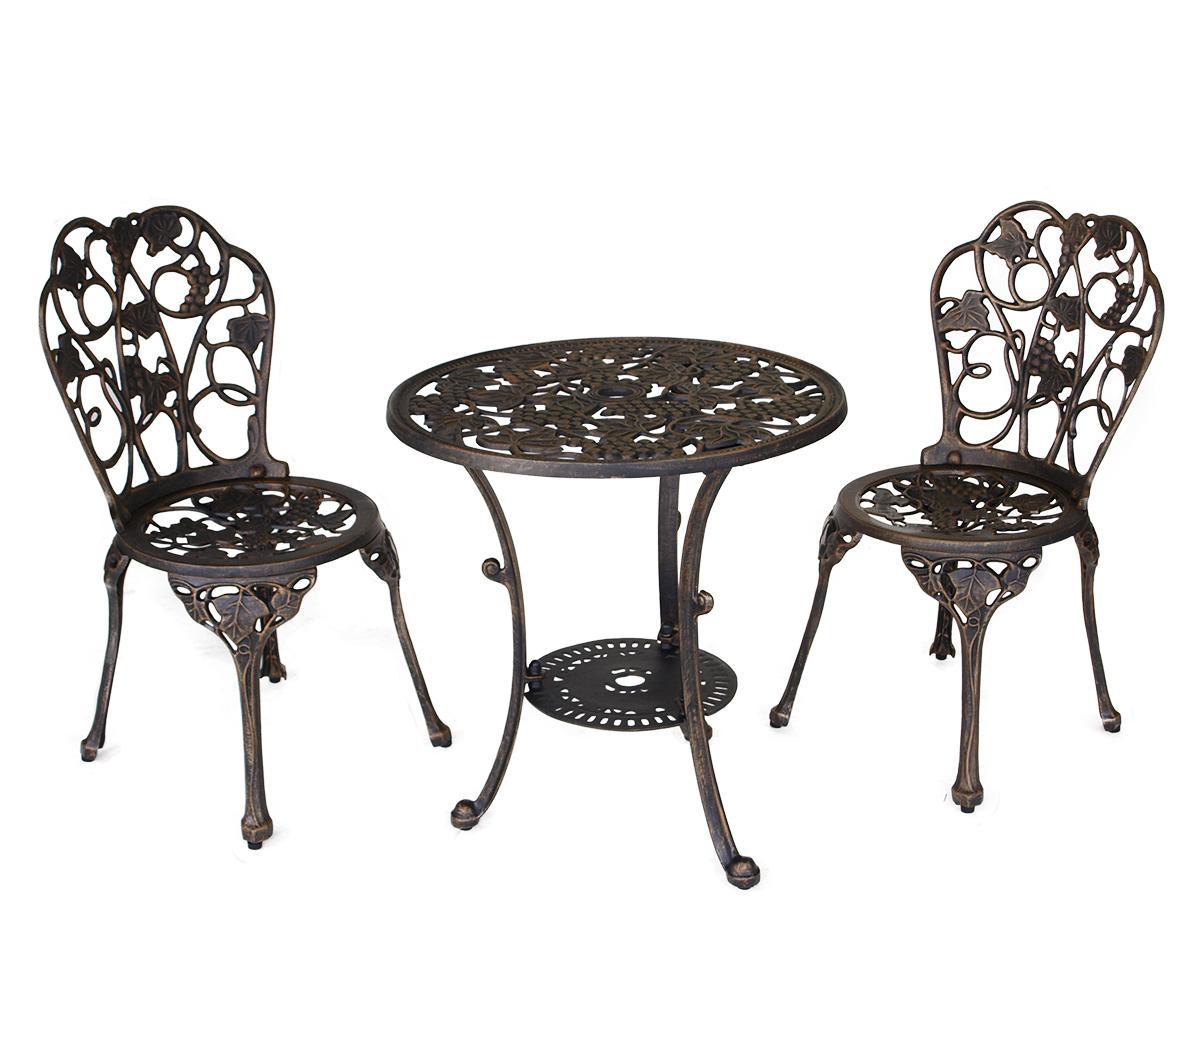 bistroset amsterdam 2 teilig aluminium aluguss bronze antik 2 wahl ebay. Black Bedroom Furniture Sets. Home Design Ideas